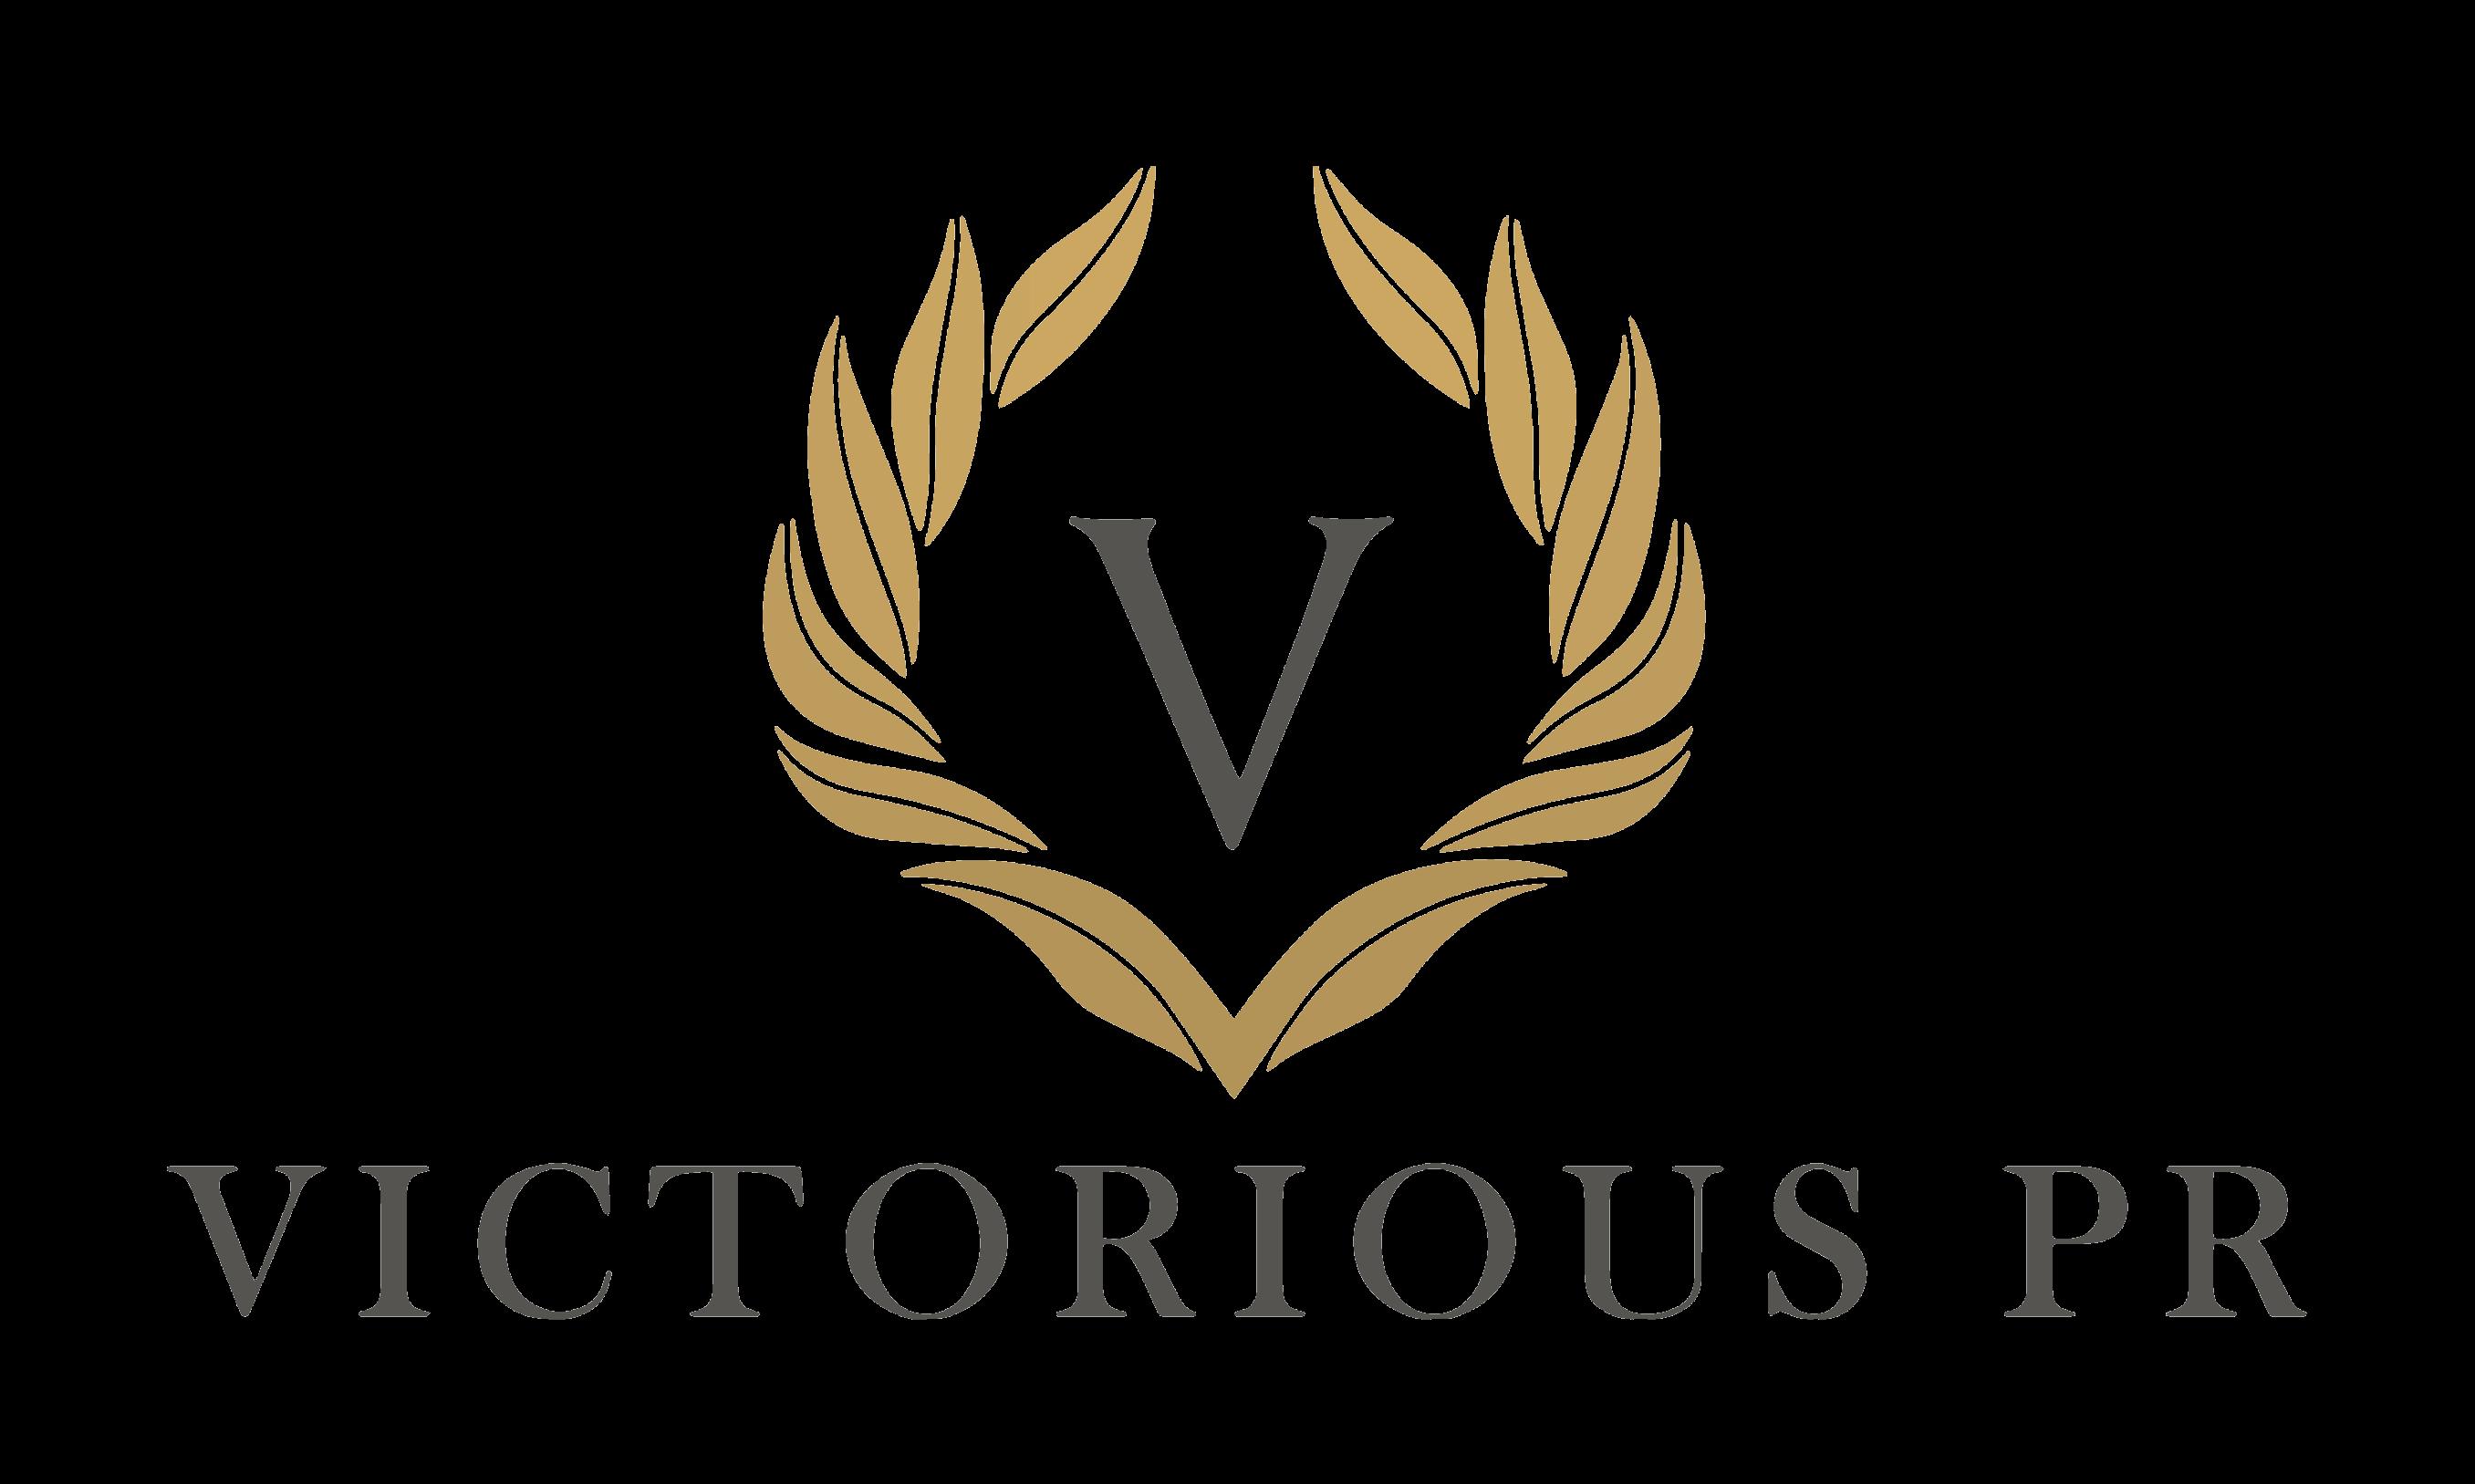 Victorious PR